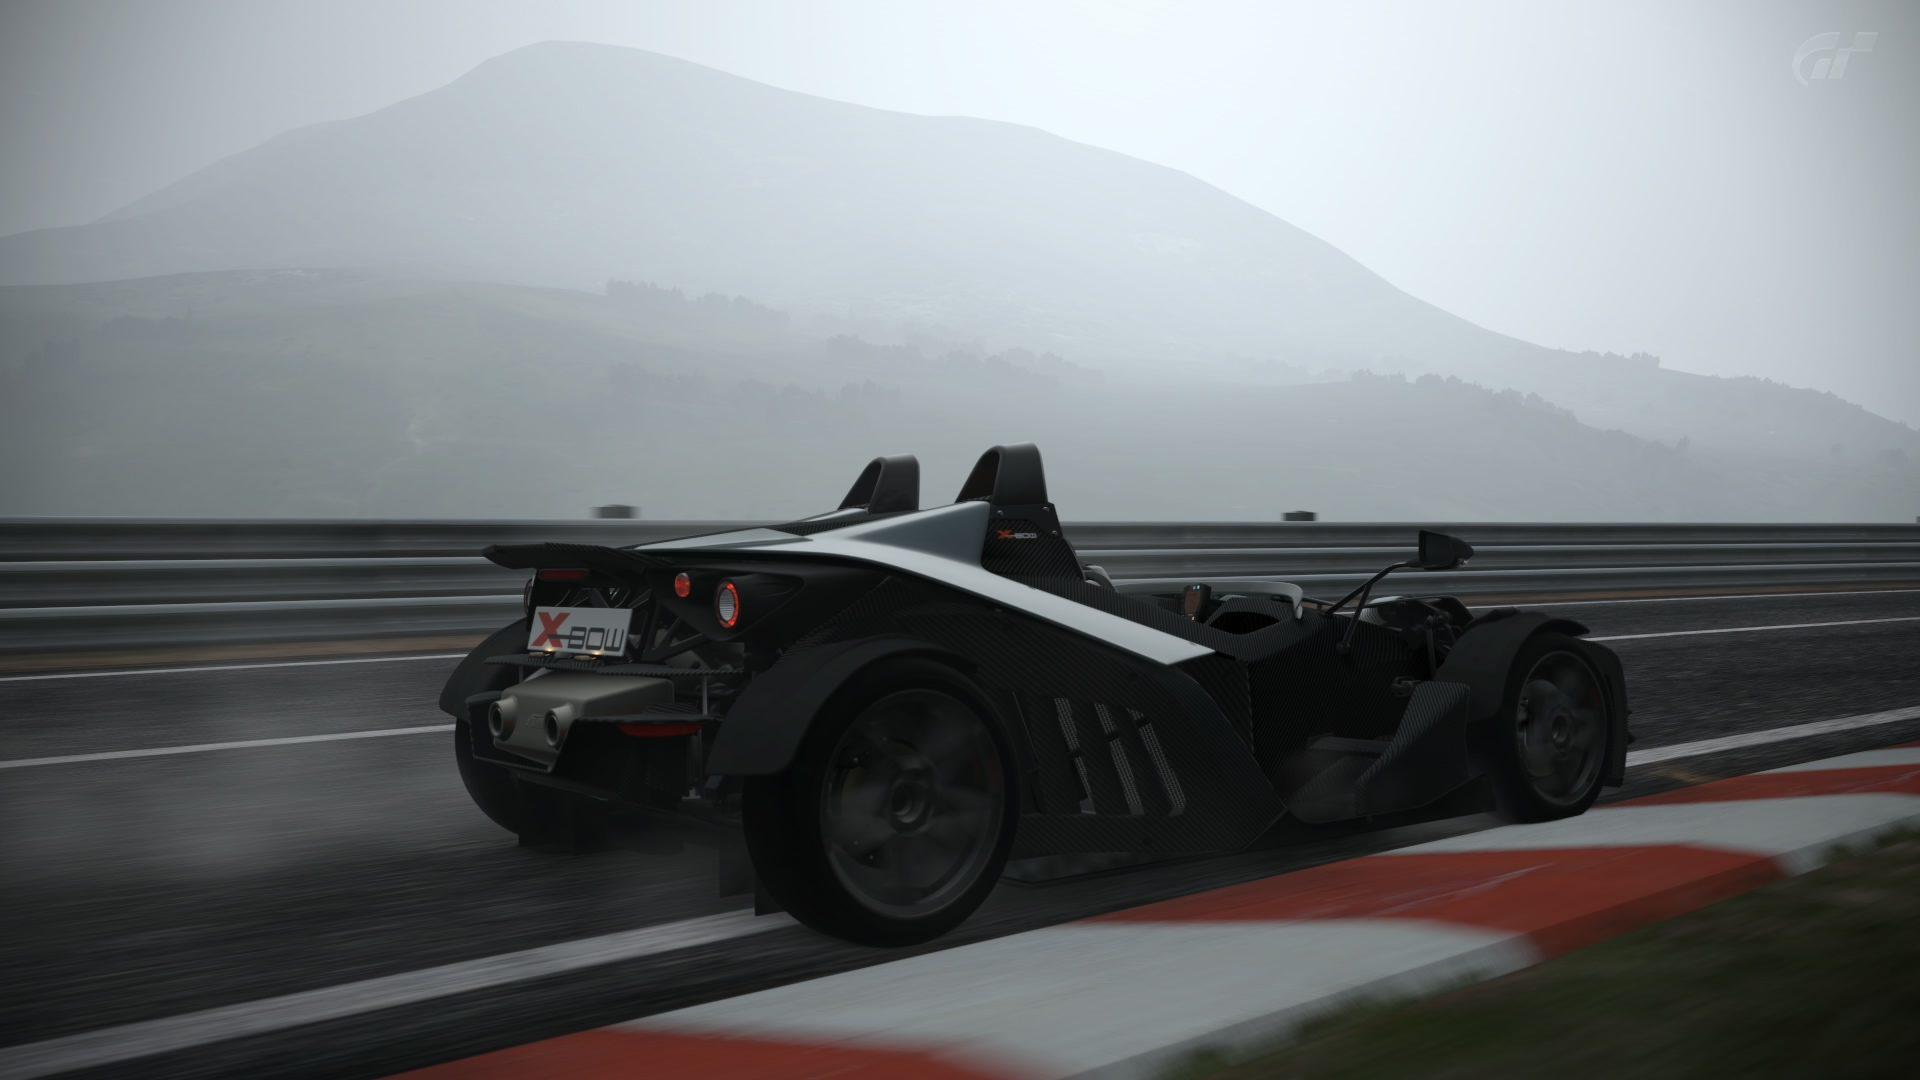 Circuito de la Sierra - X-Bow wet day 12.jpg